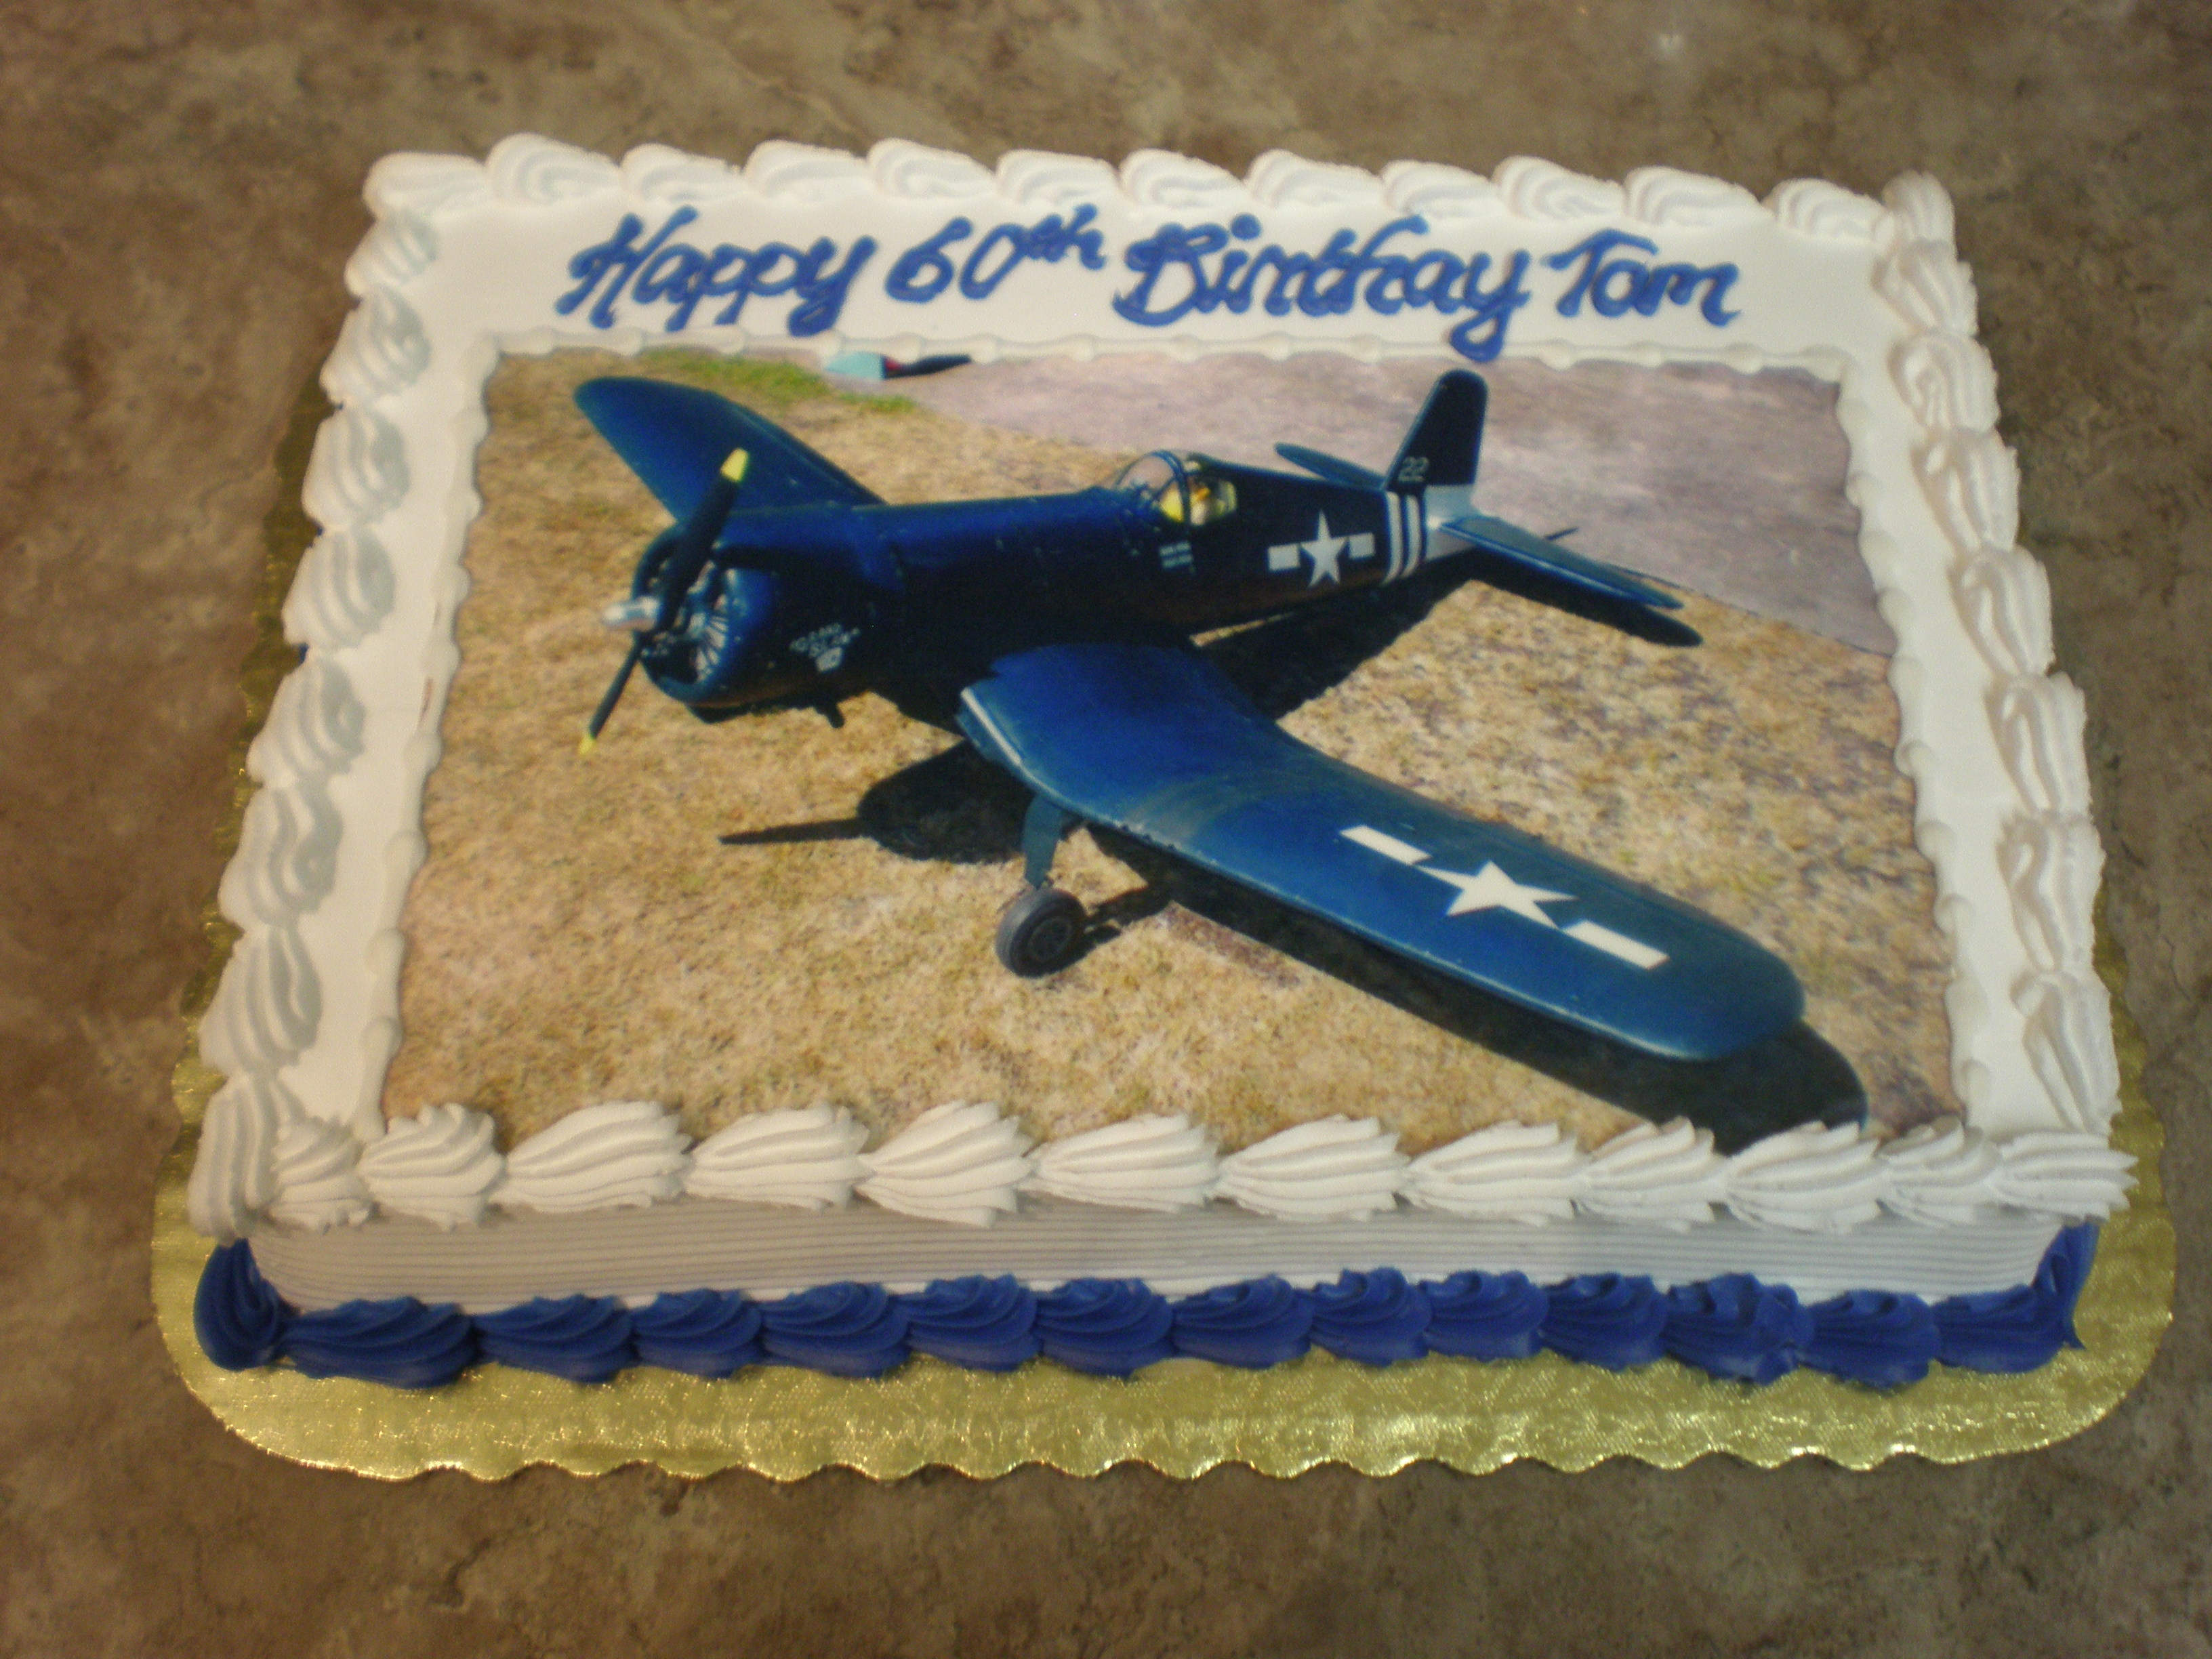 Strange Show Us Your Rc Birthday Cakes Rcu Forums Funny Birthday Cards Online Inifofree Goldxyz